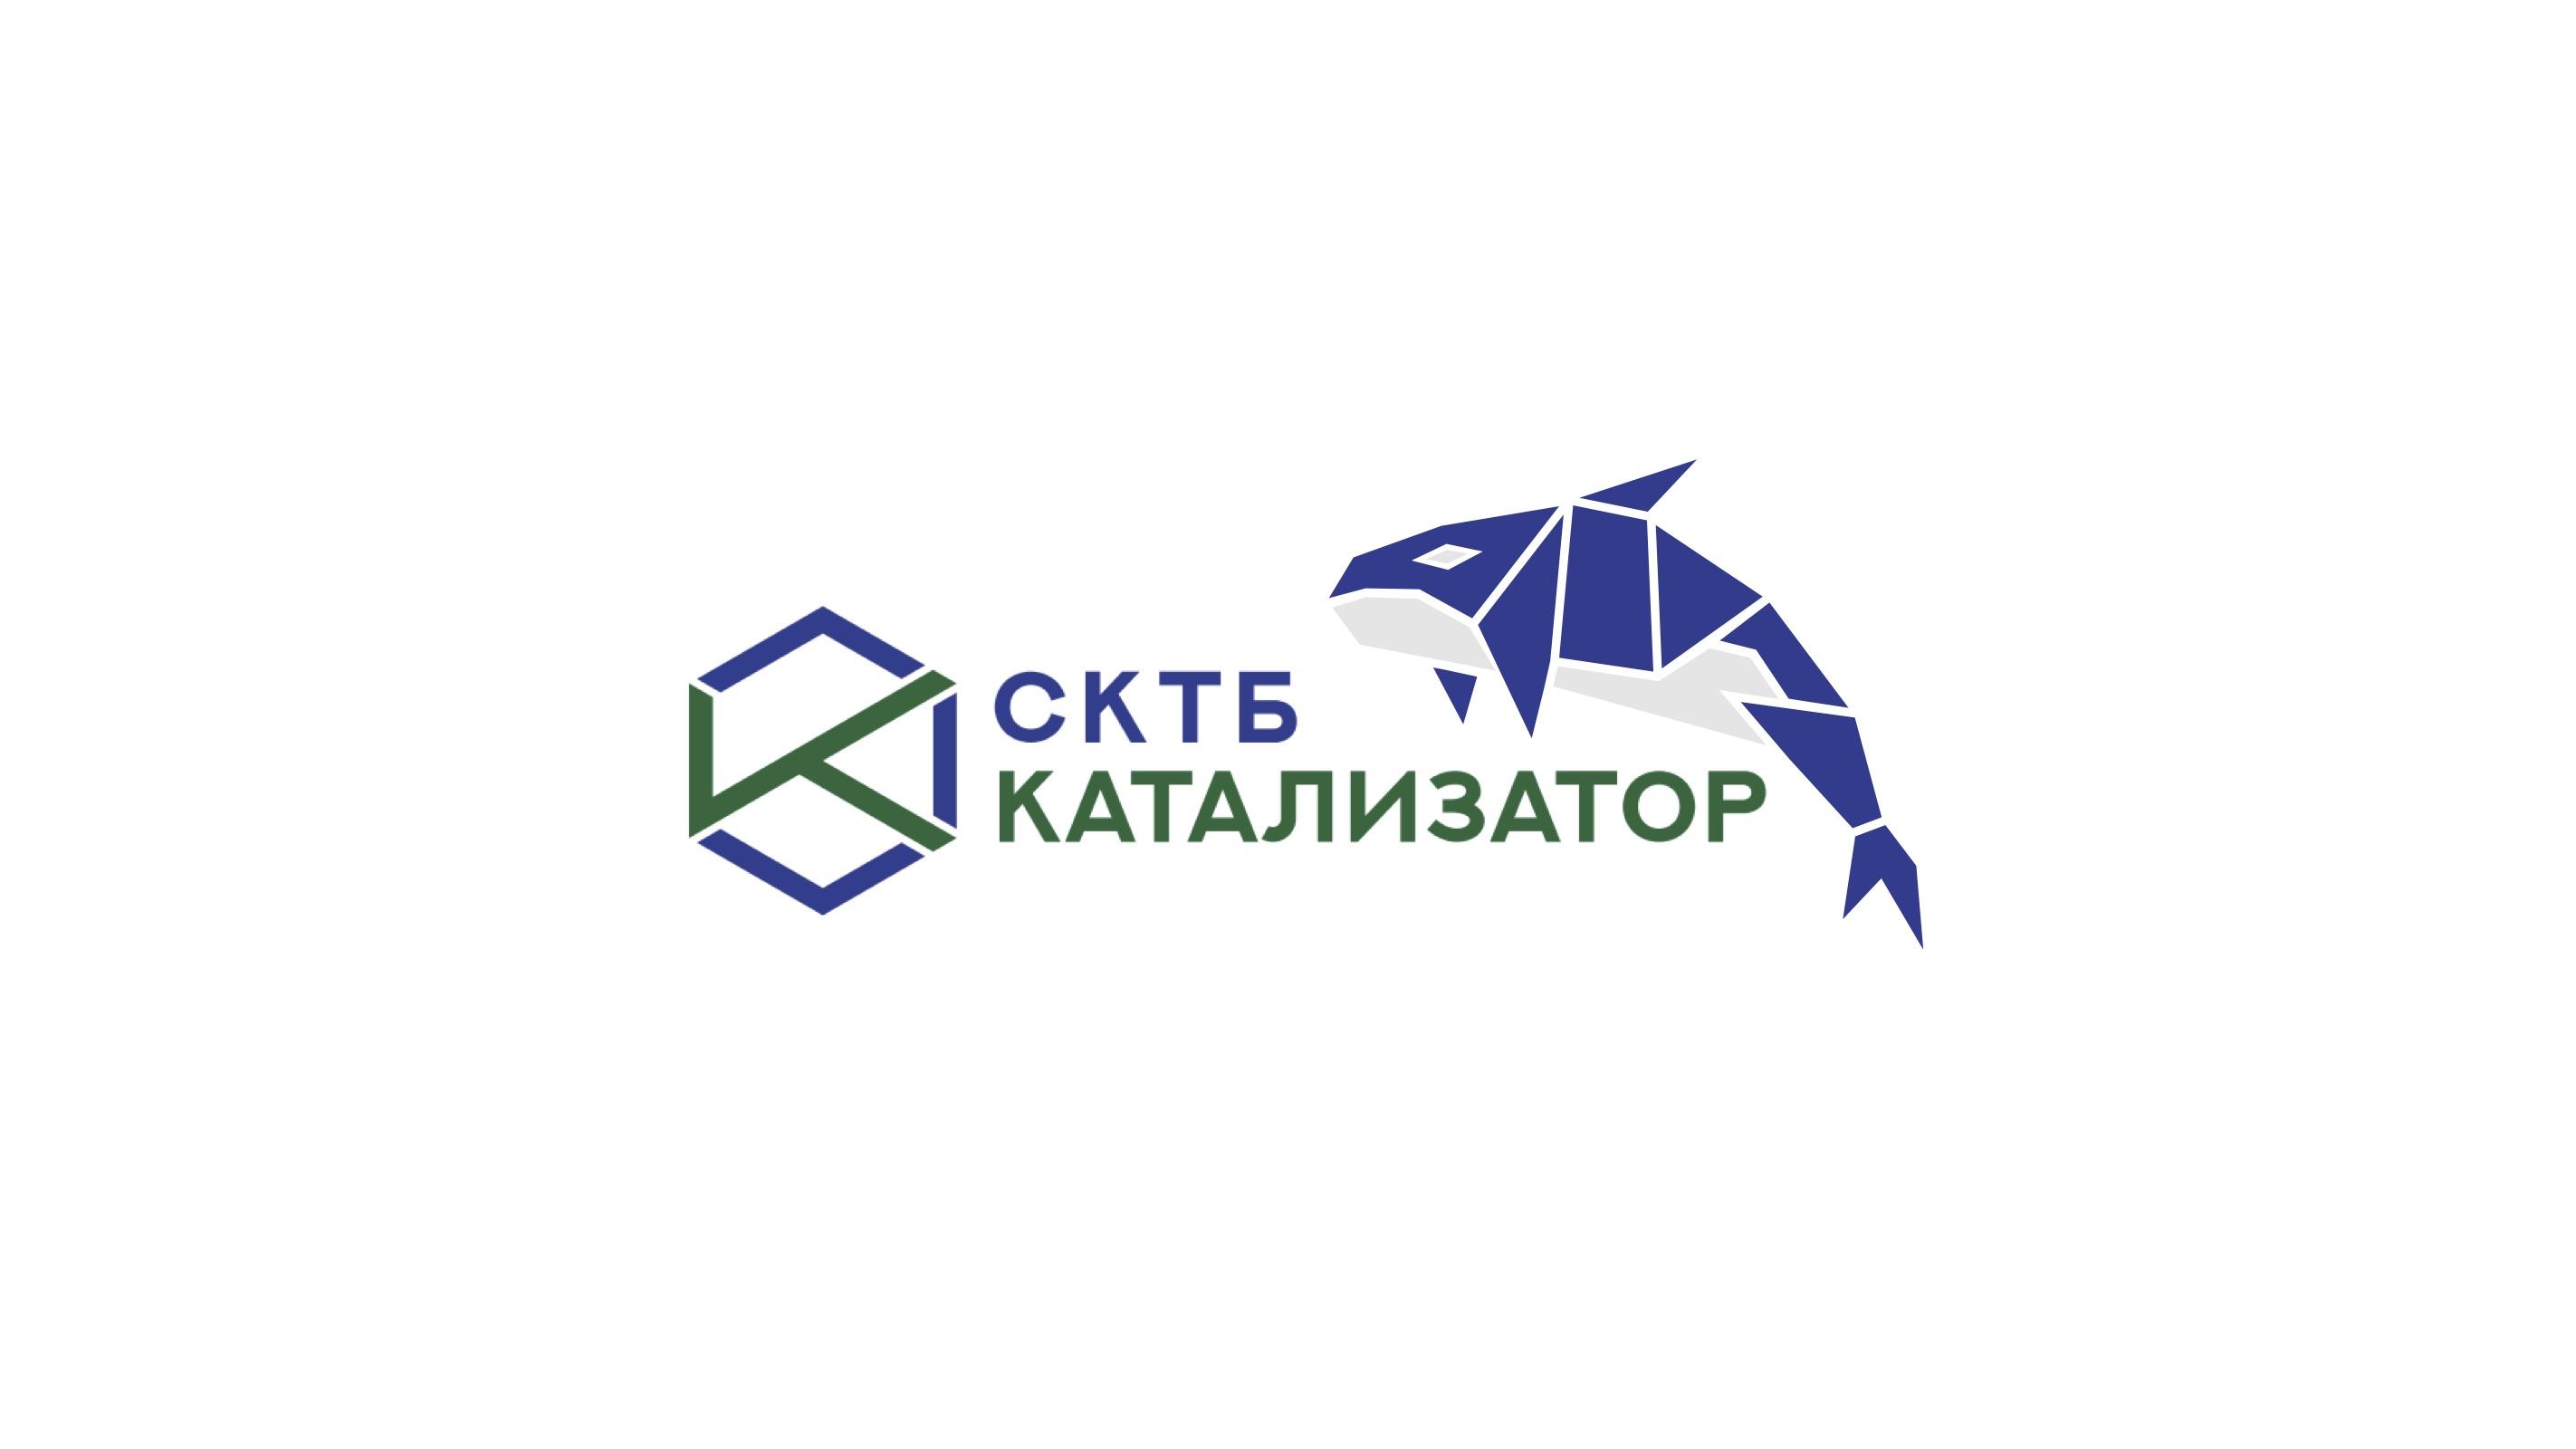 Разработка фирменного символа компании - касатки, НЕ ЛОГОТИП фото f_2225afe70259deb0.jpg